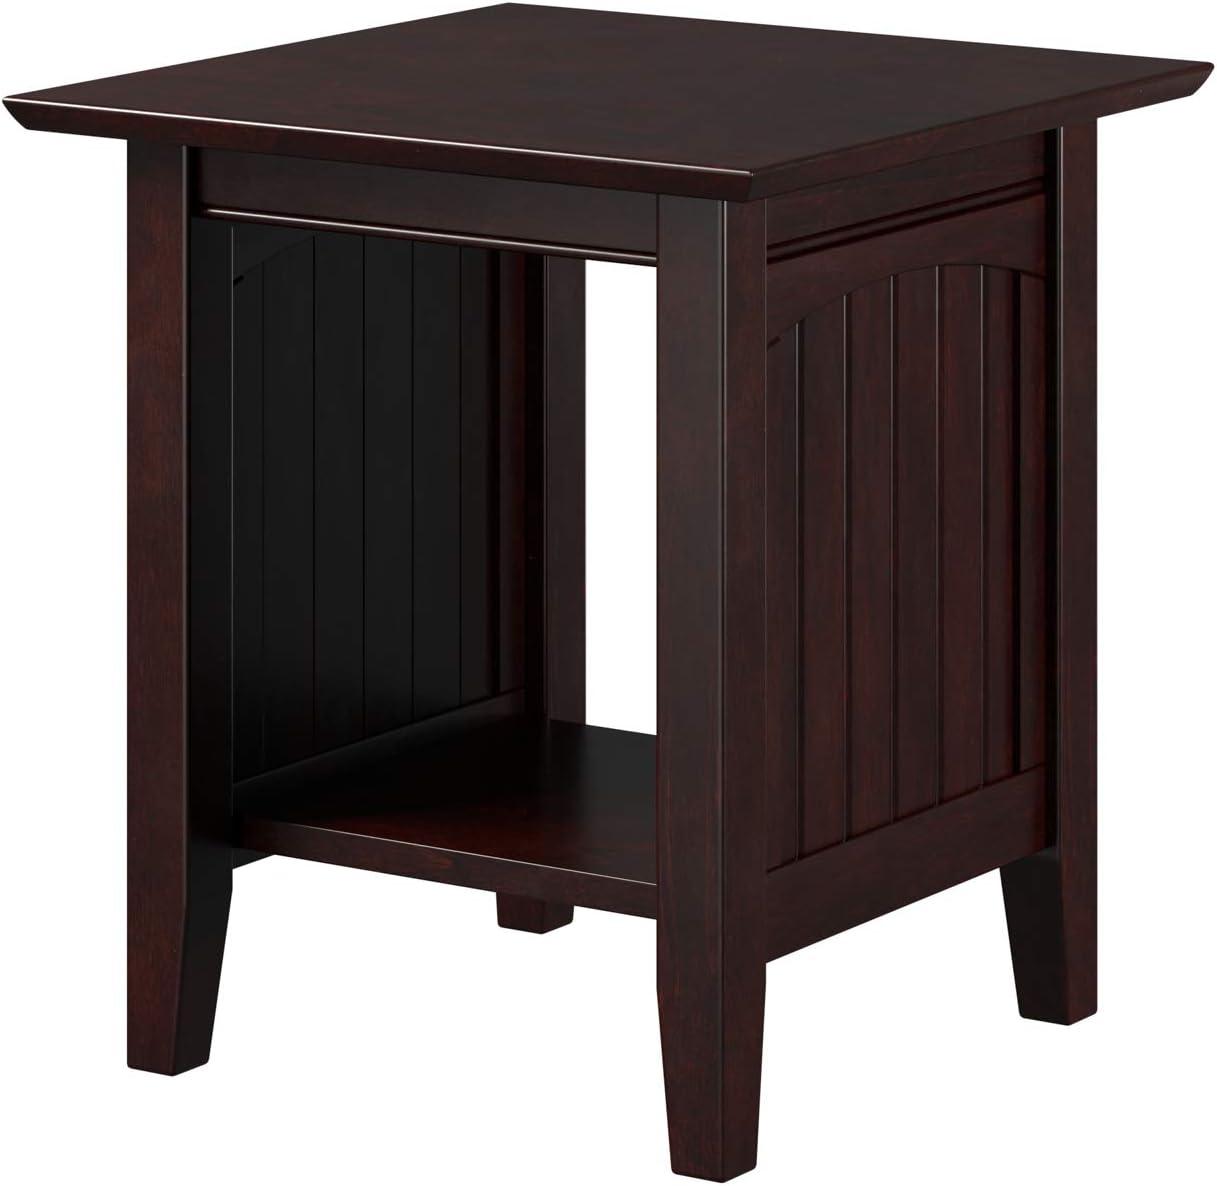 Atlantic Furniture Nantucket Chair Side Table, Espresso